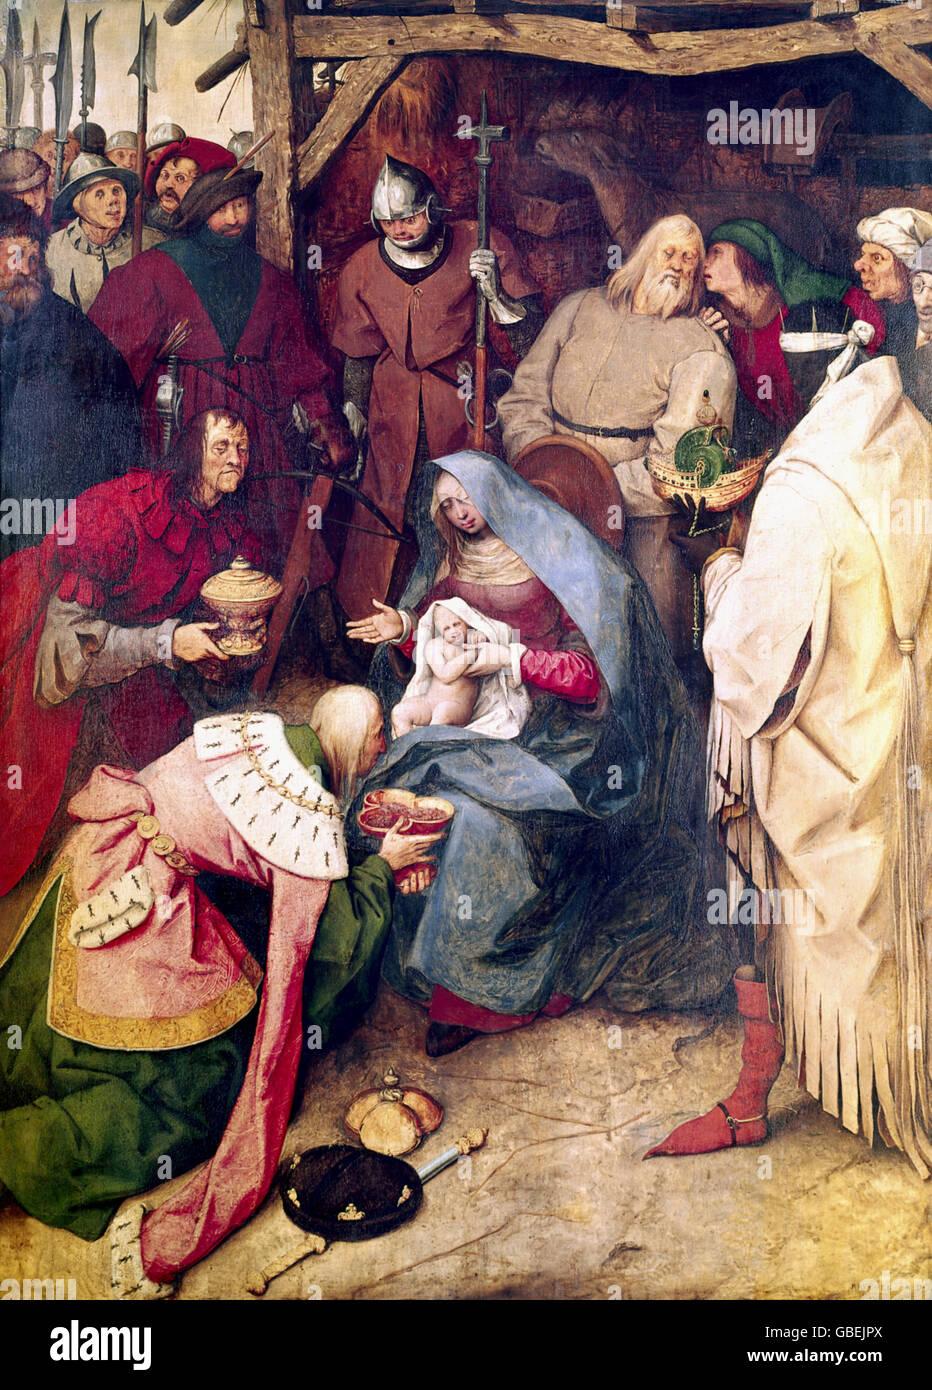 Adoration of the Magi by Pieter Brueghel the Elder - Stock Image